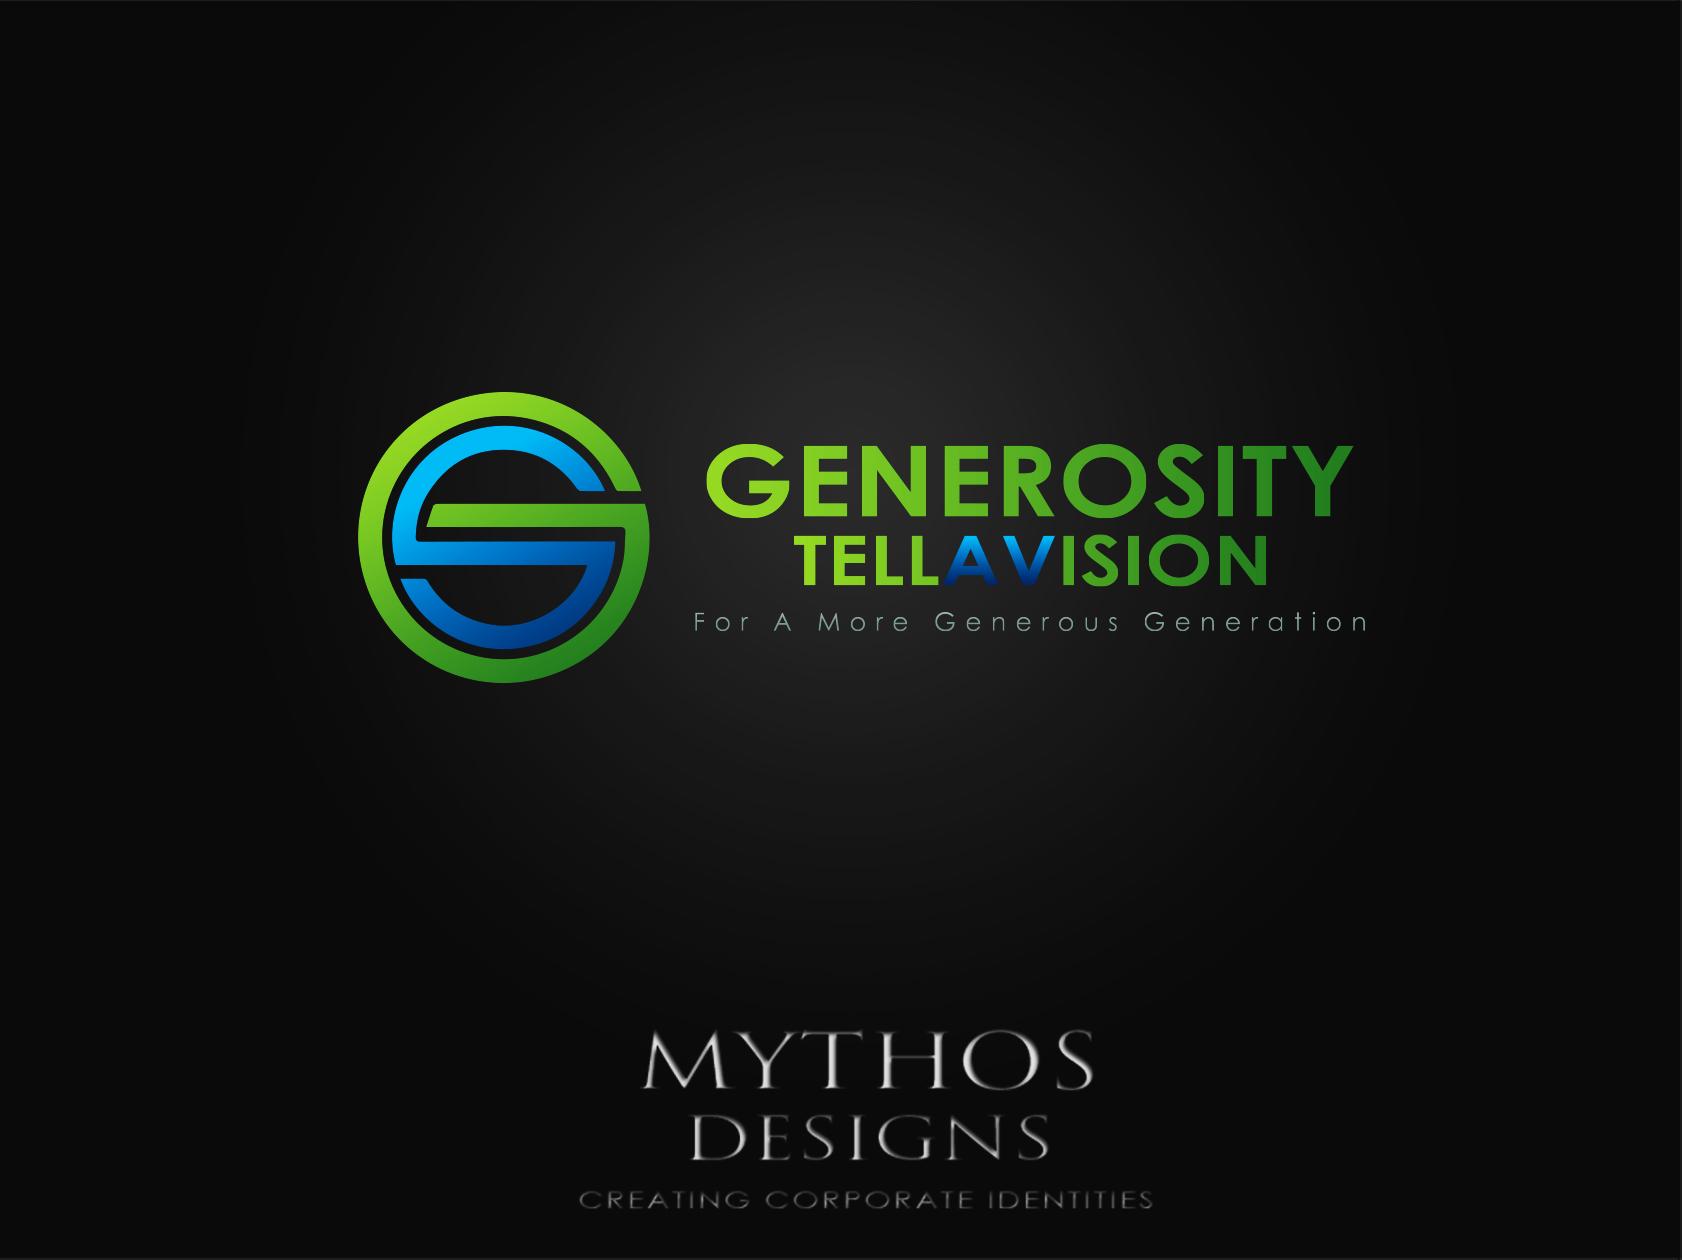 Logo Design by Mythos Designs - Entry No. 82 in the Logo Design Contest Artistic Logo Design for Generosity TellAVision.